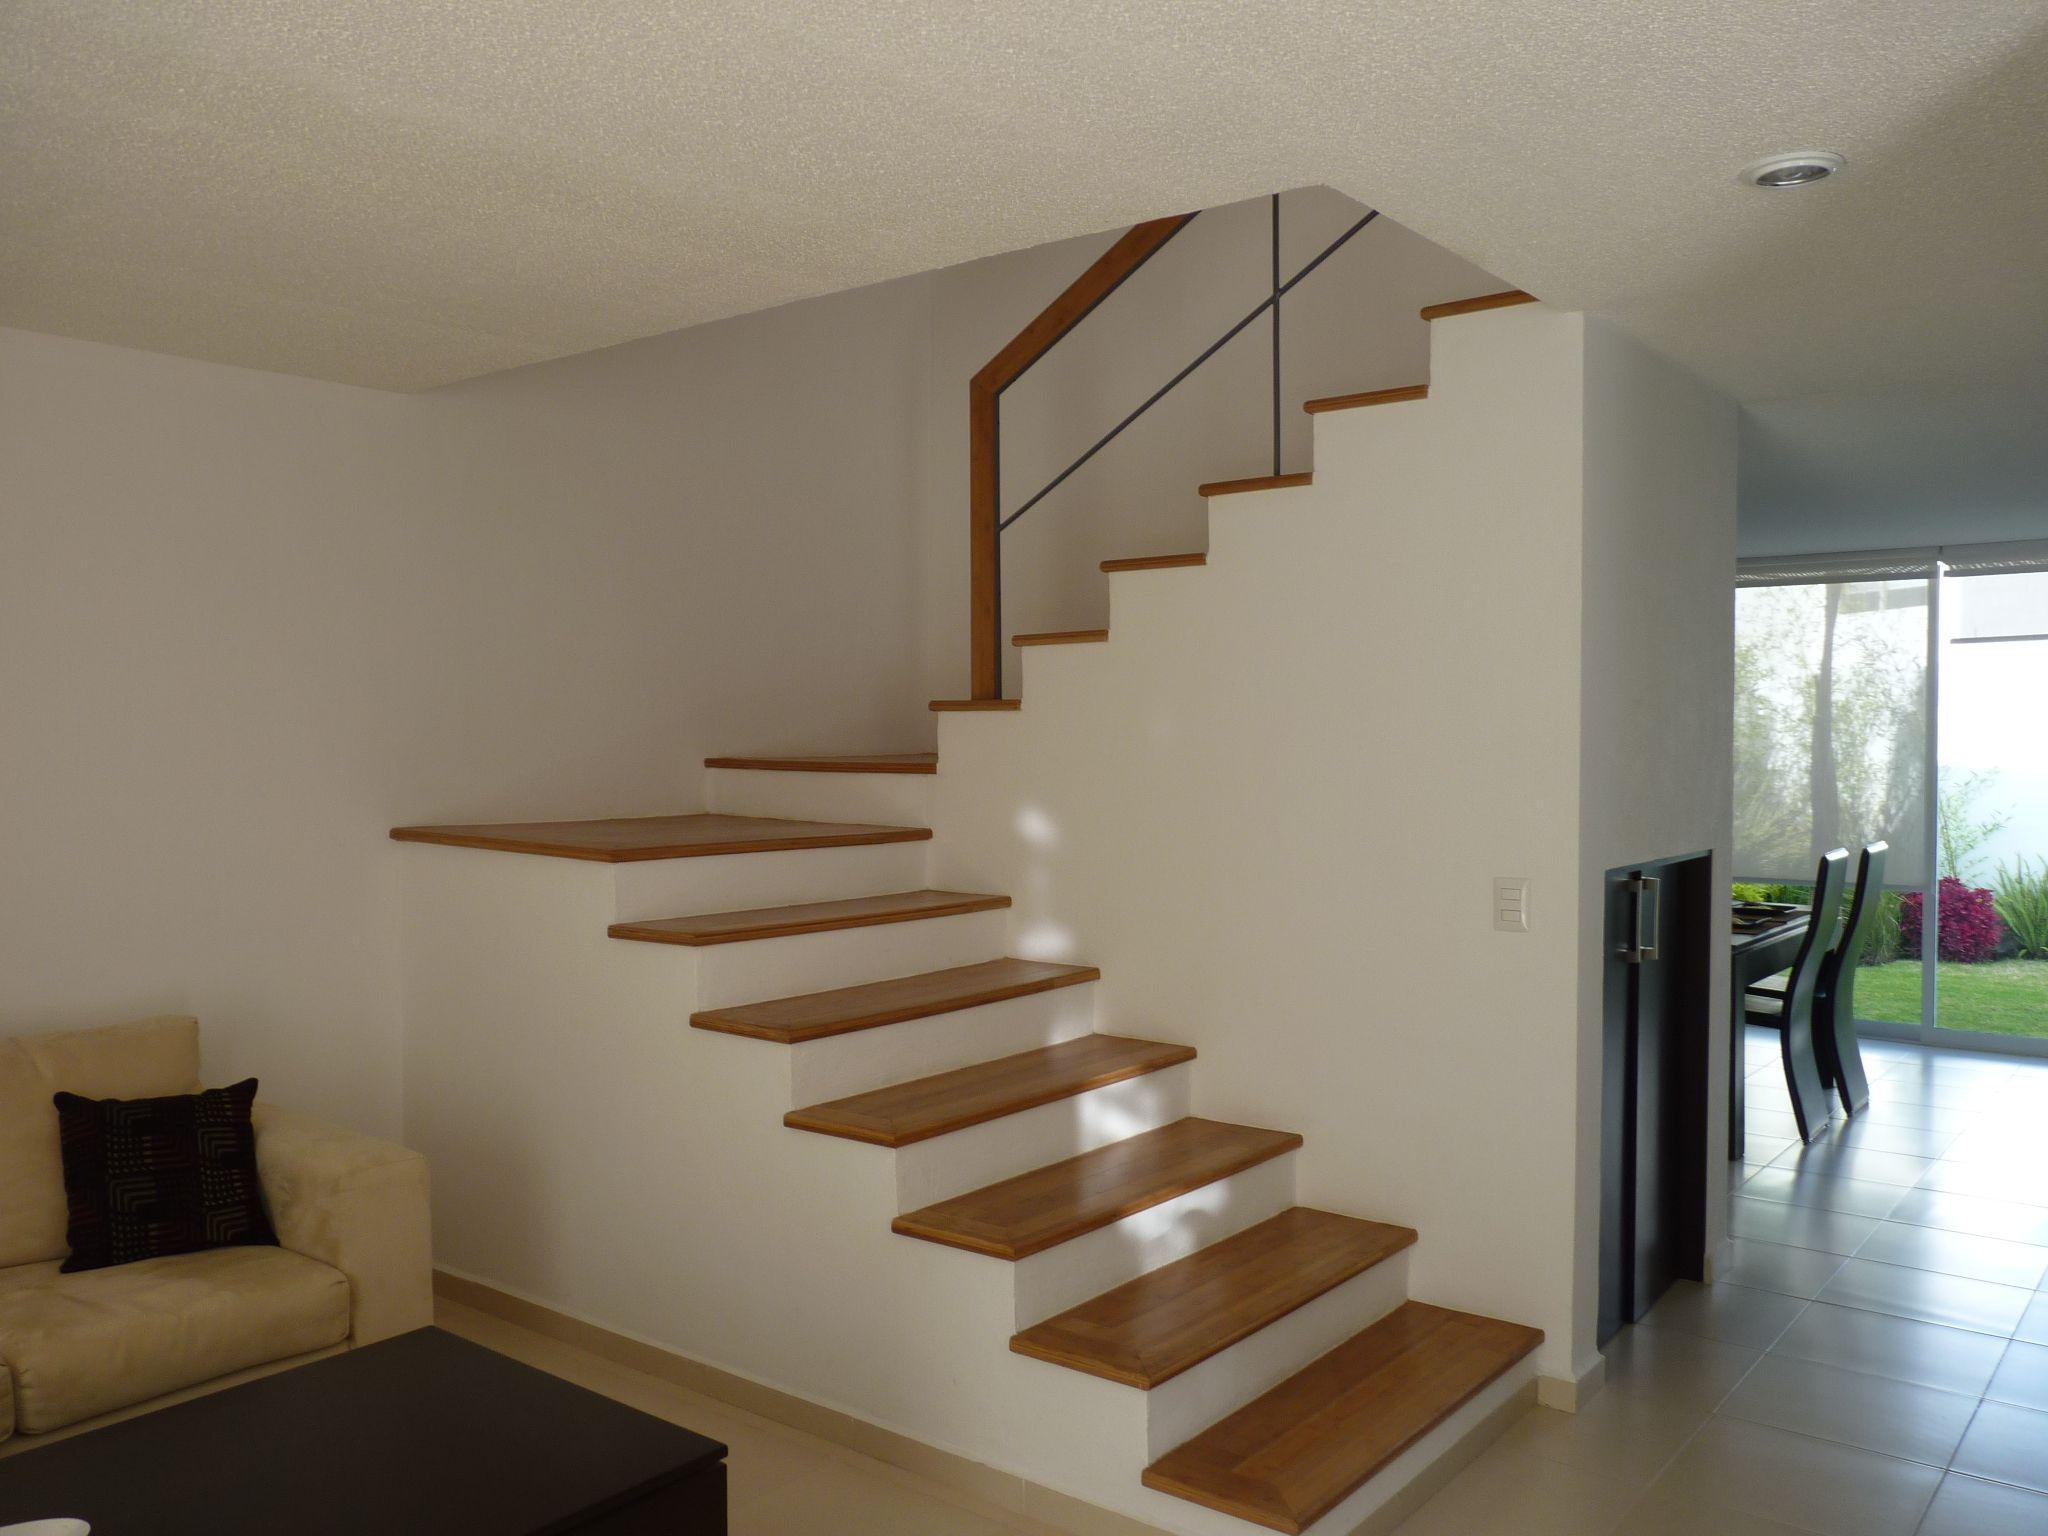 Modelos de escaleras de interiores de casas cool - Escaleras de interiores ...